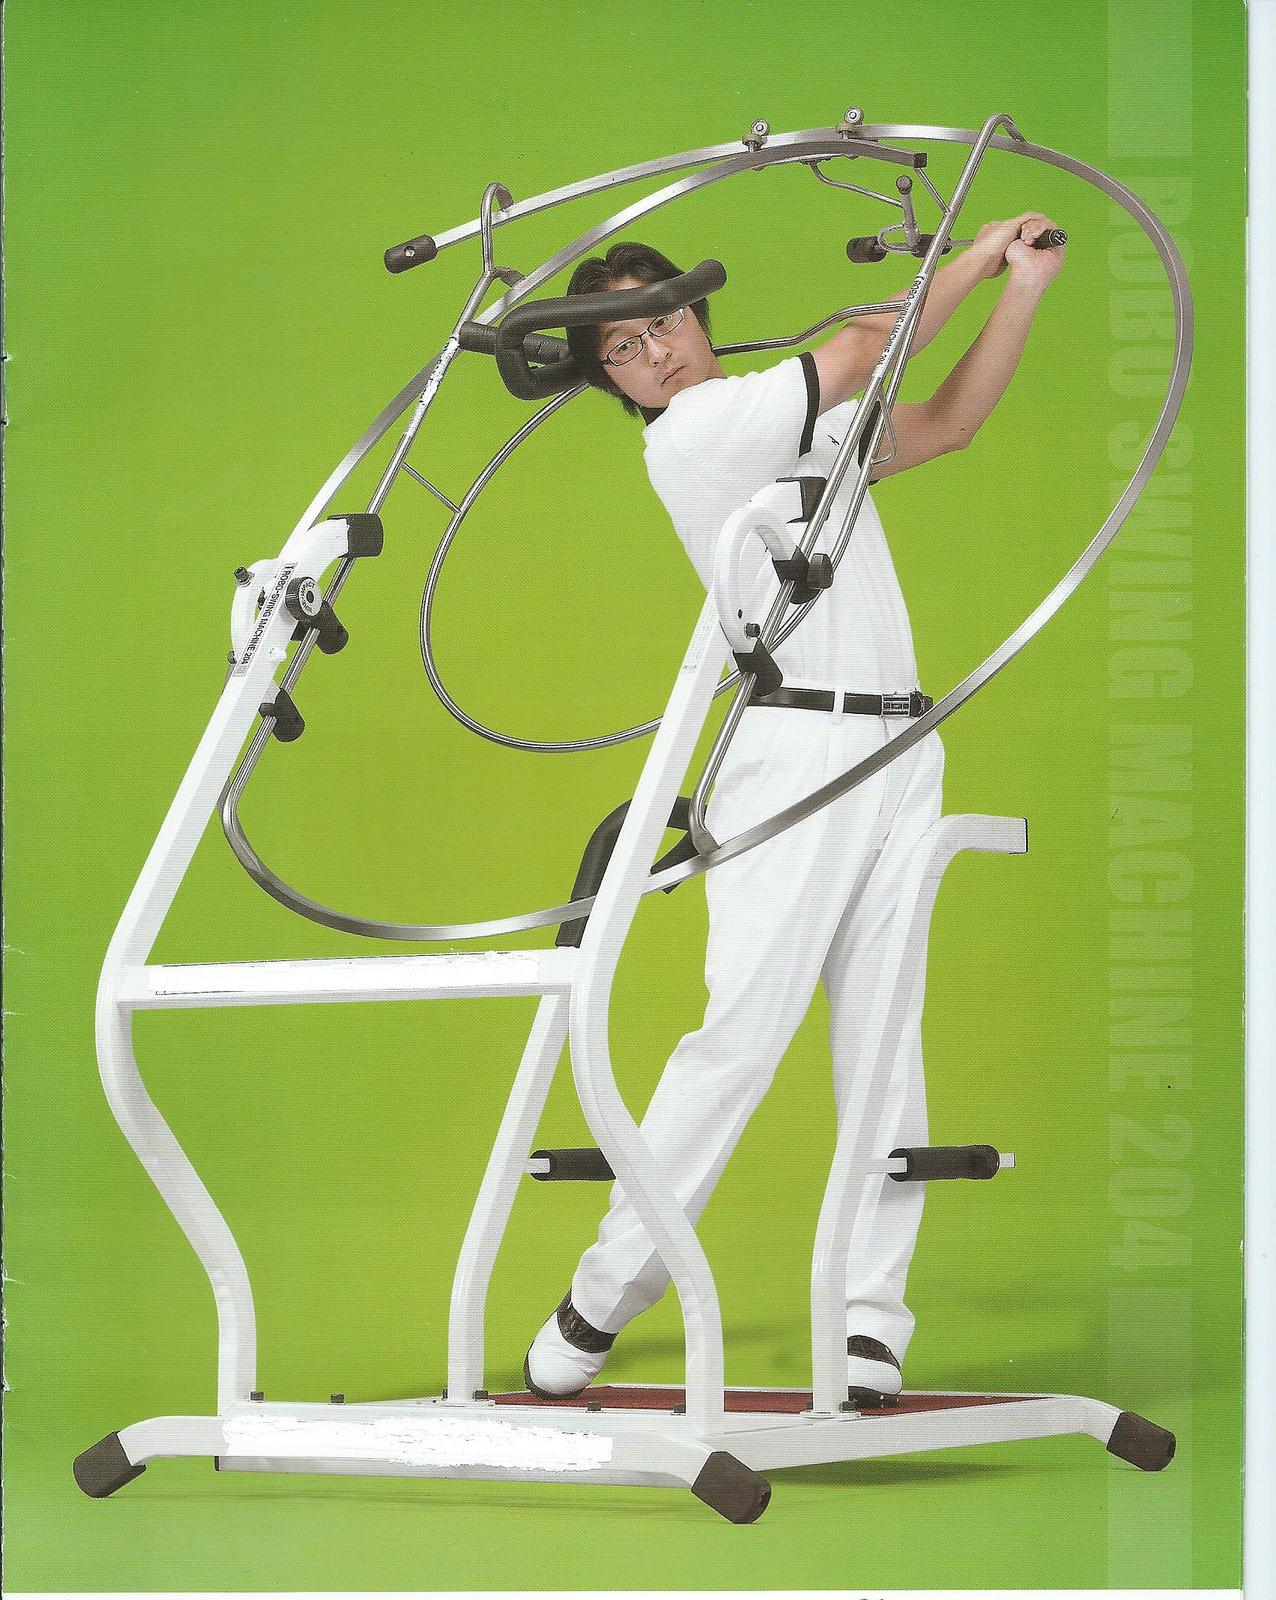 robo swing